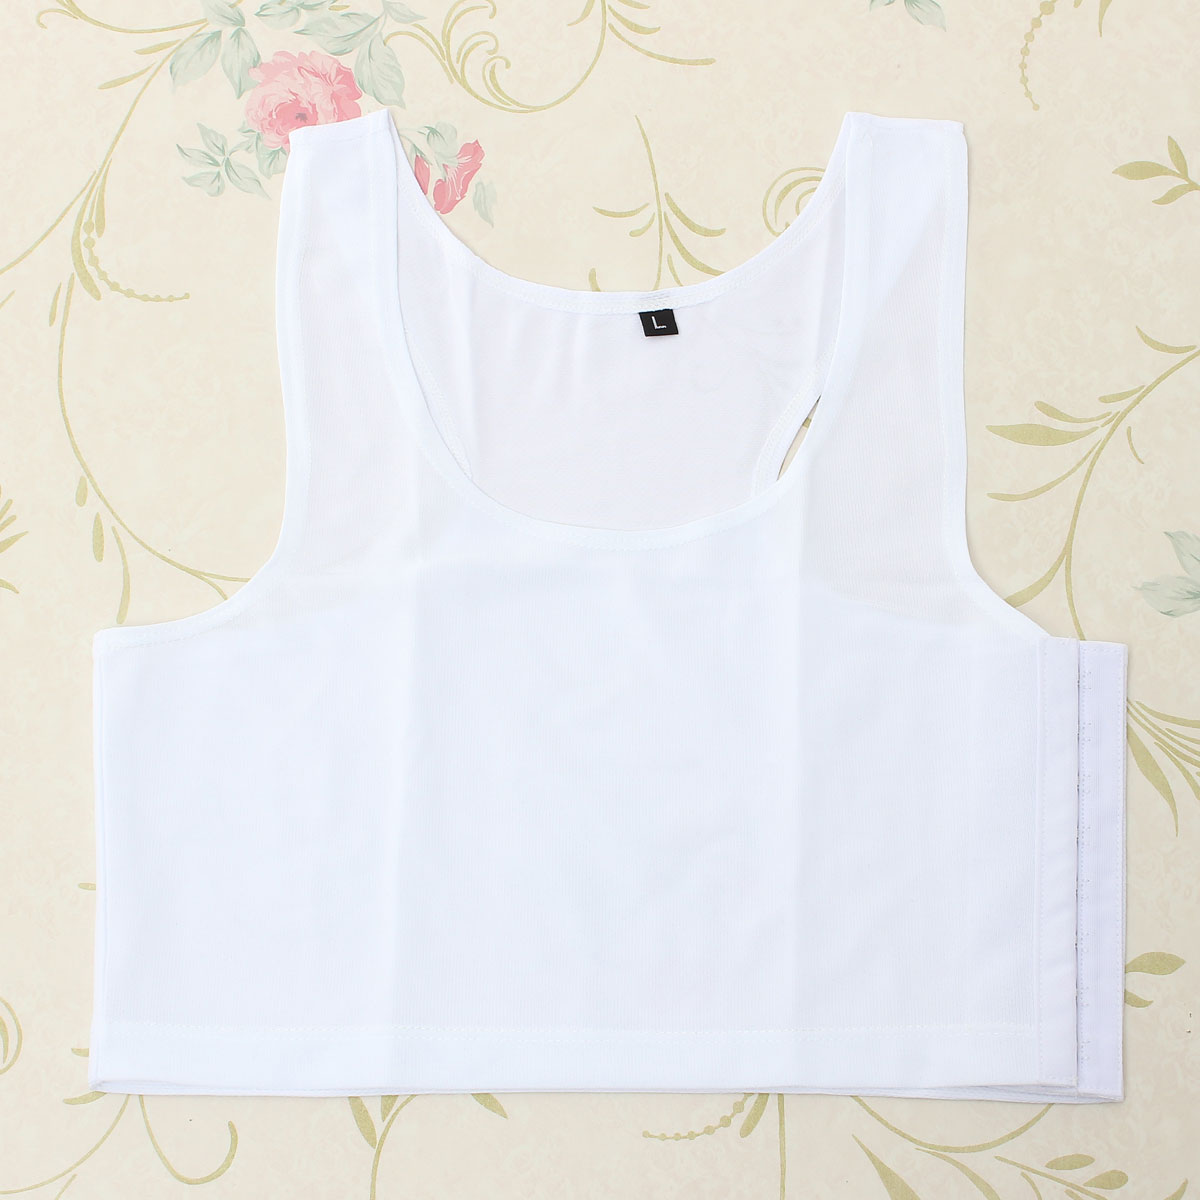 Lesbian Tomboy Les Breathable Chest Binder Short Vest Tops Tank Undershirt